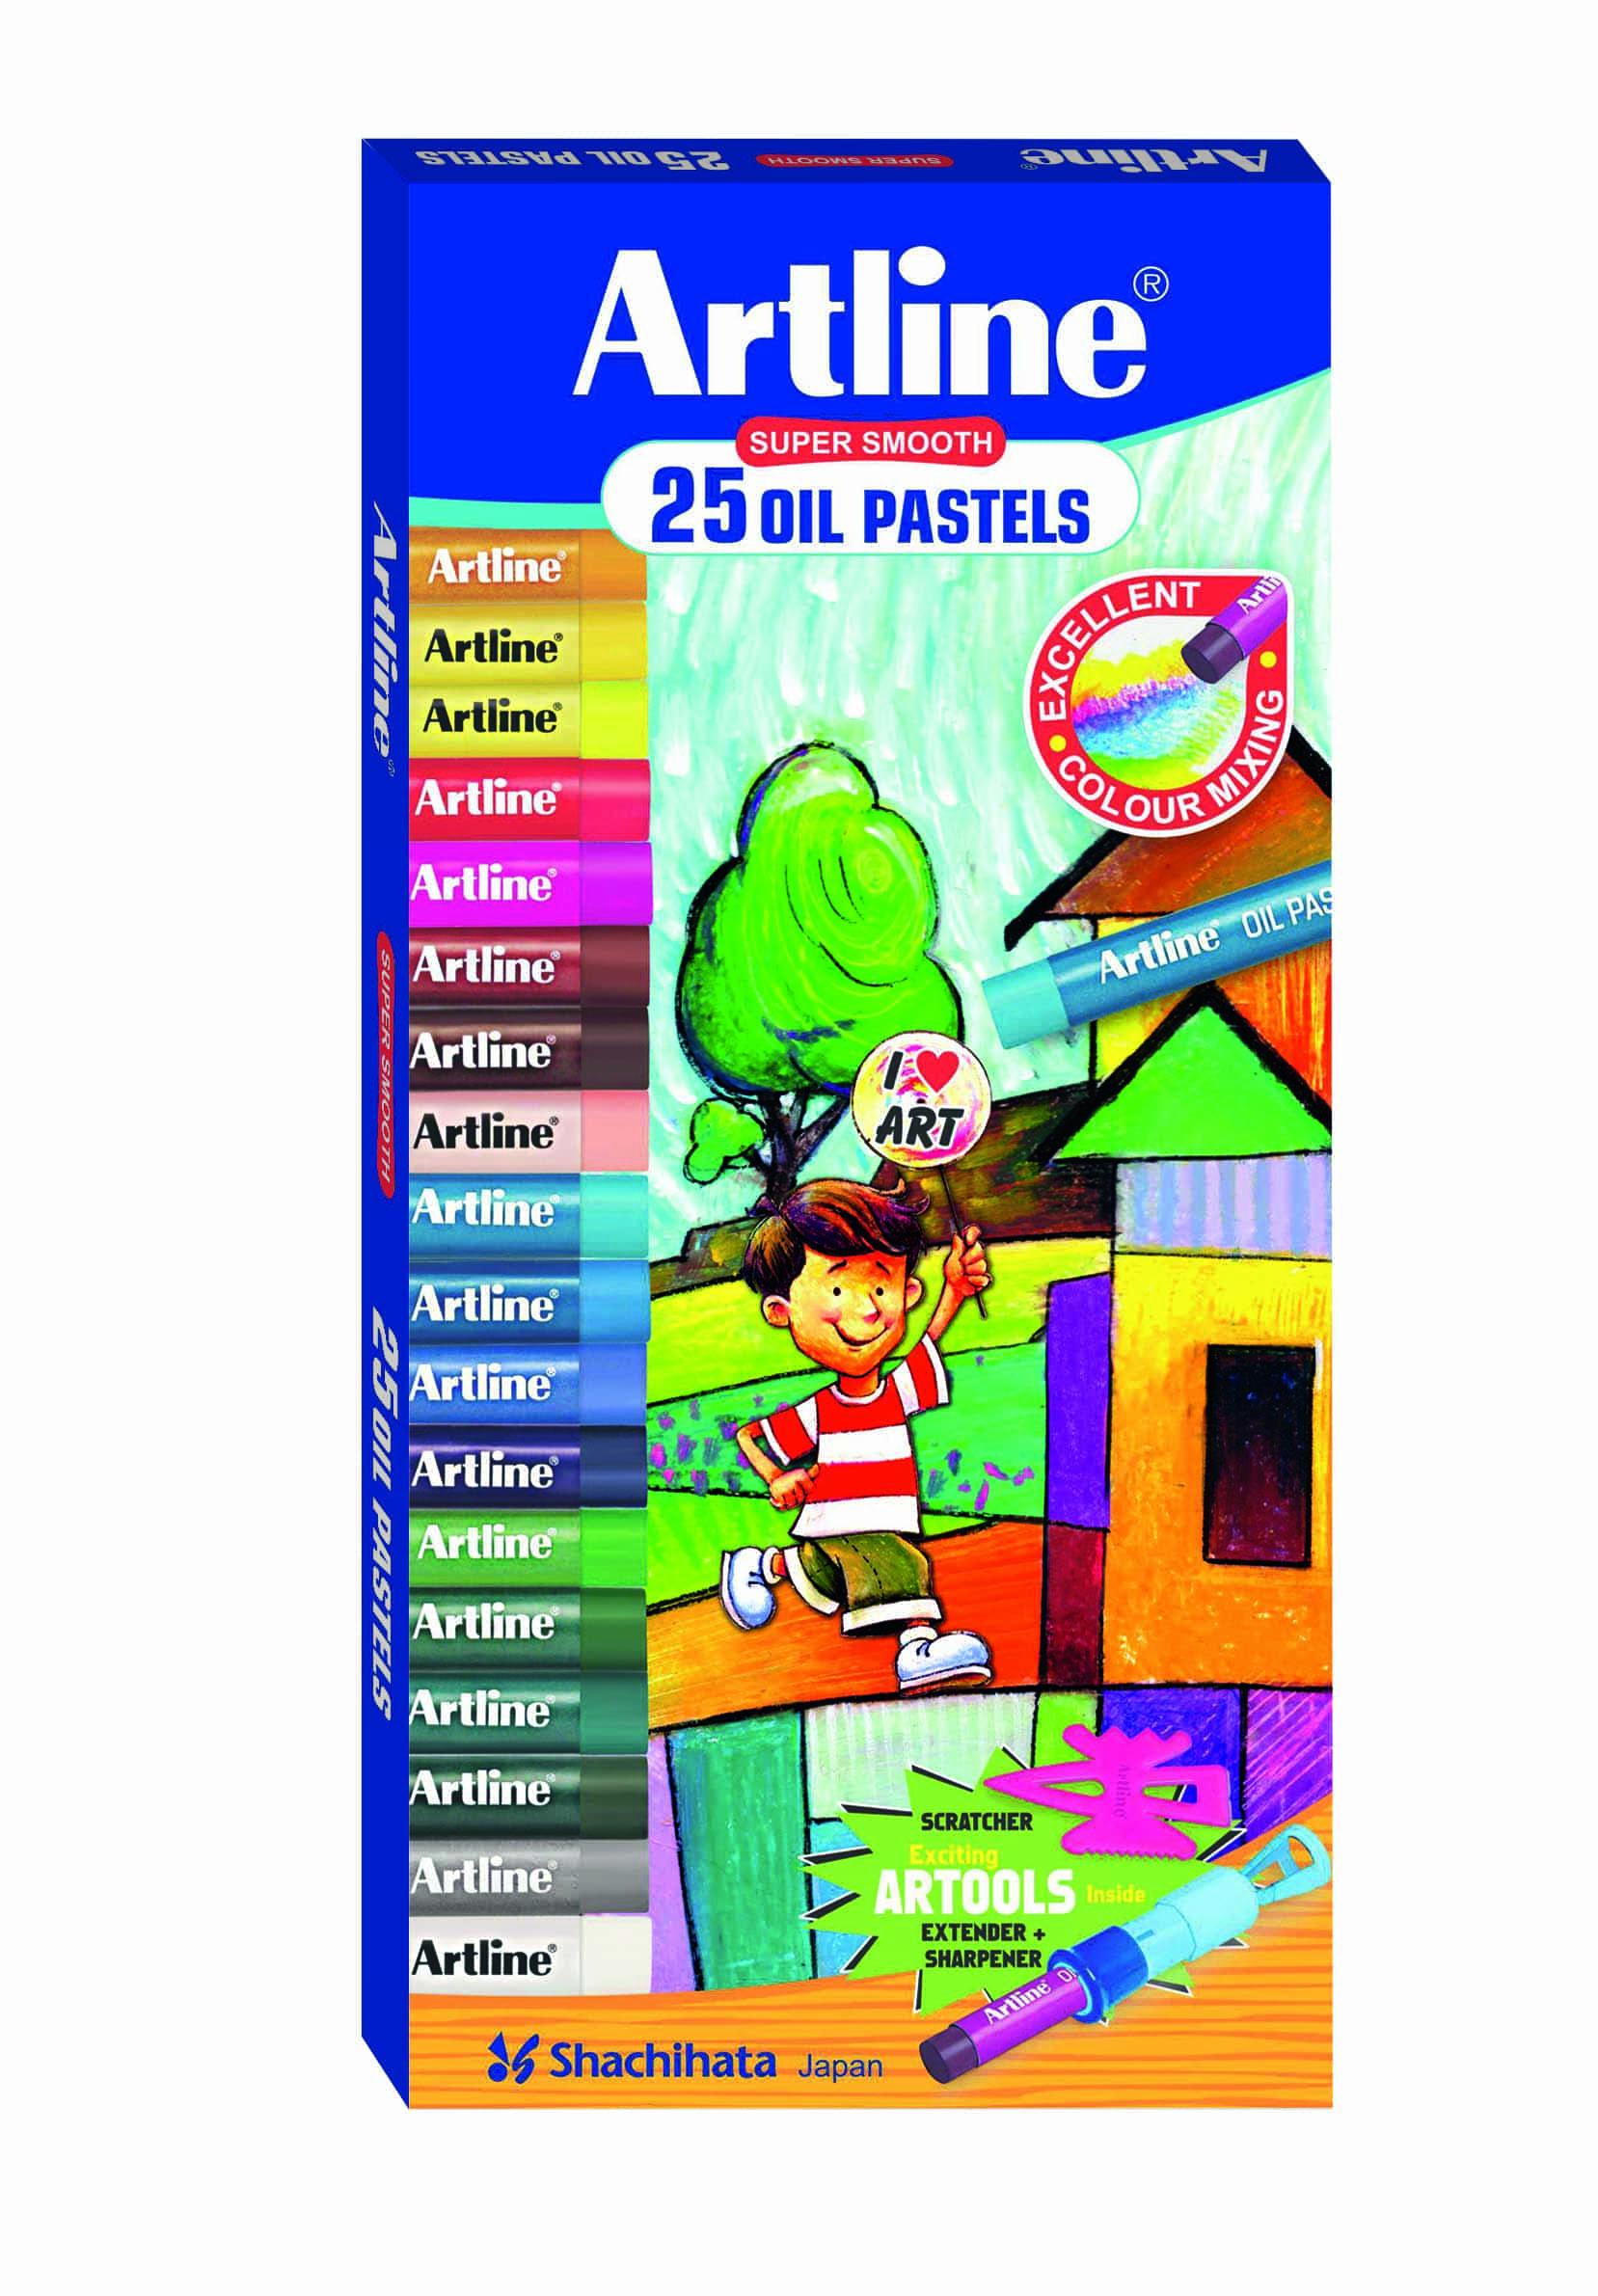 Artline Oil Pastel Colors - 25 Shades